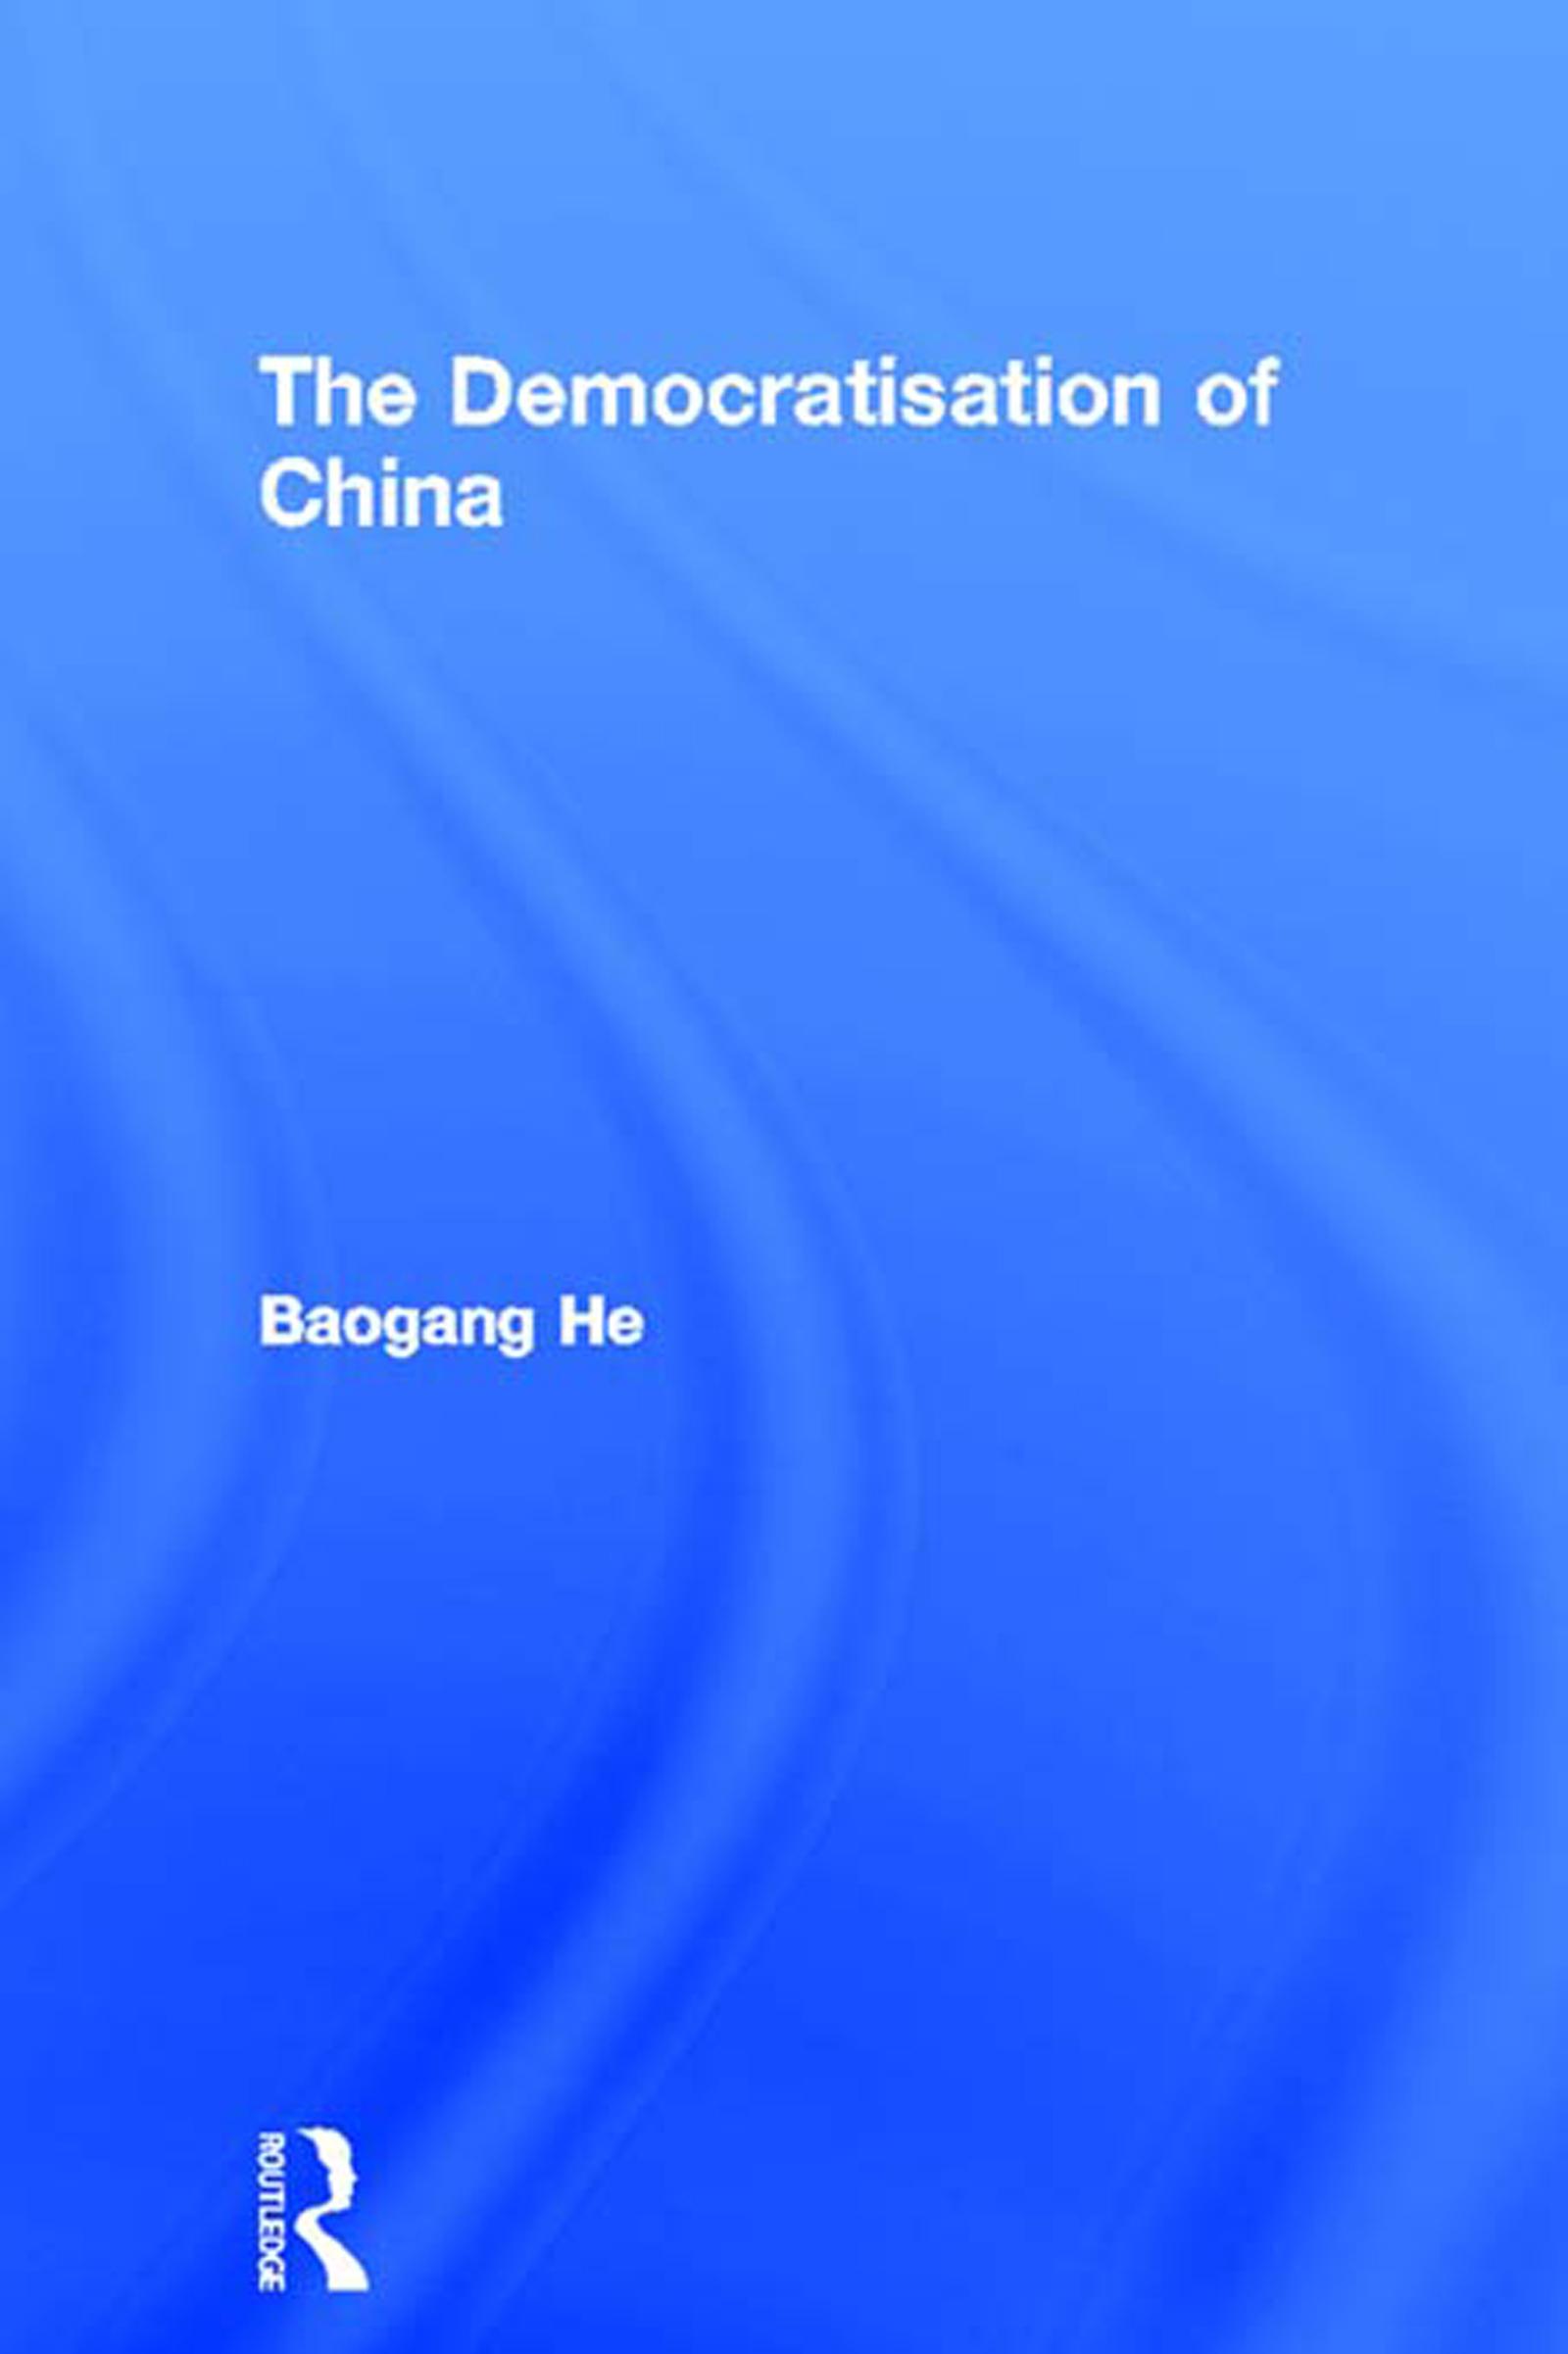 The Democratisation of China